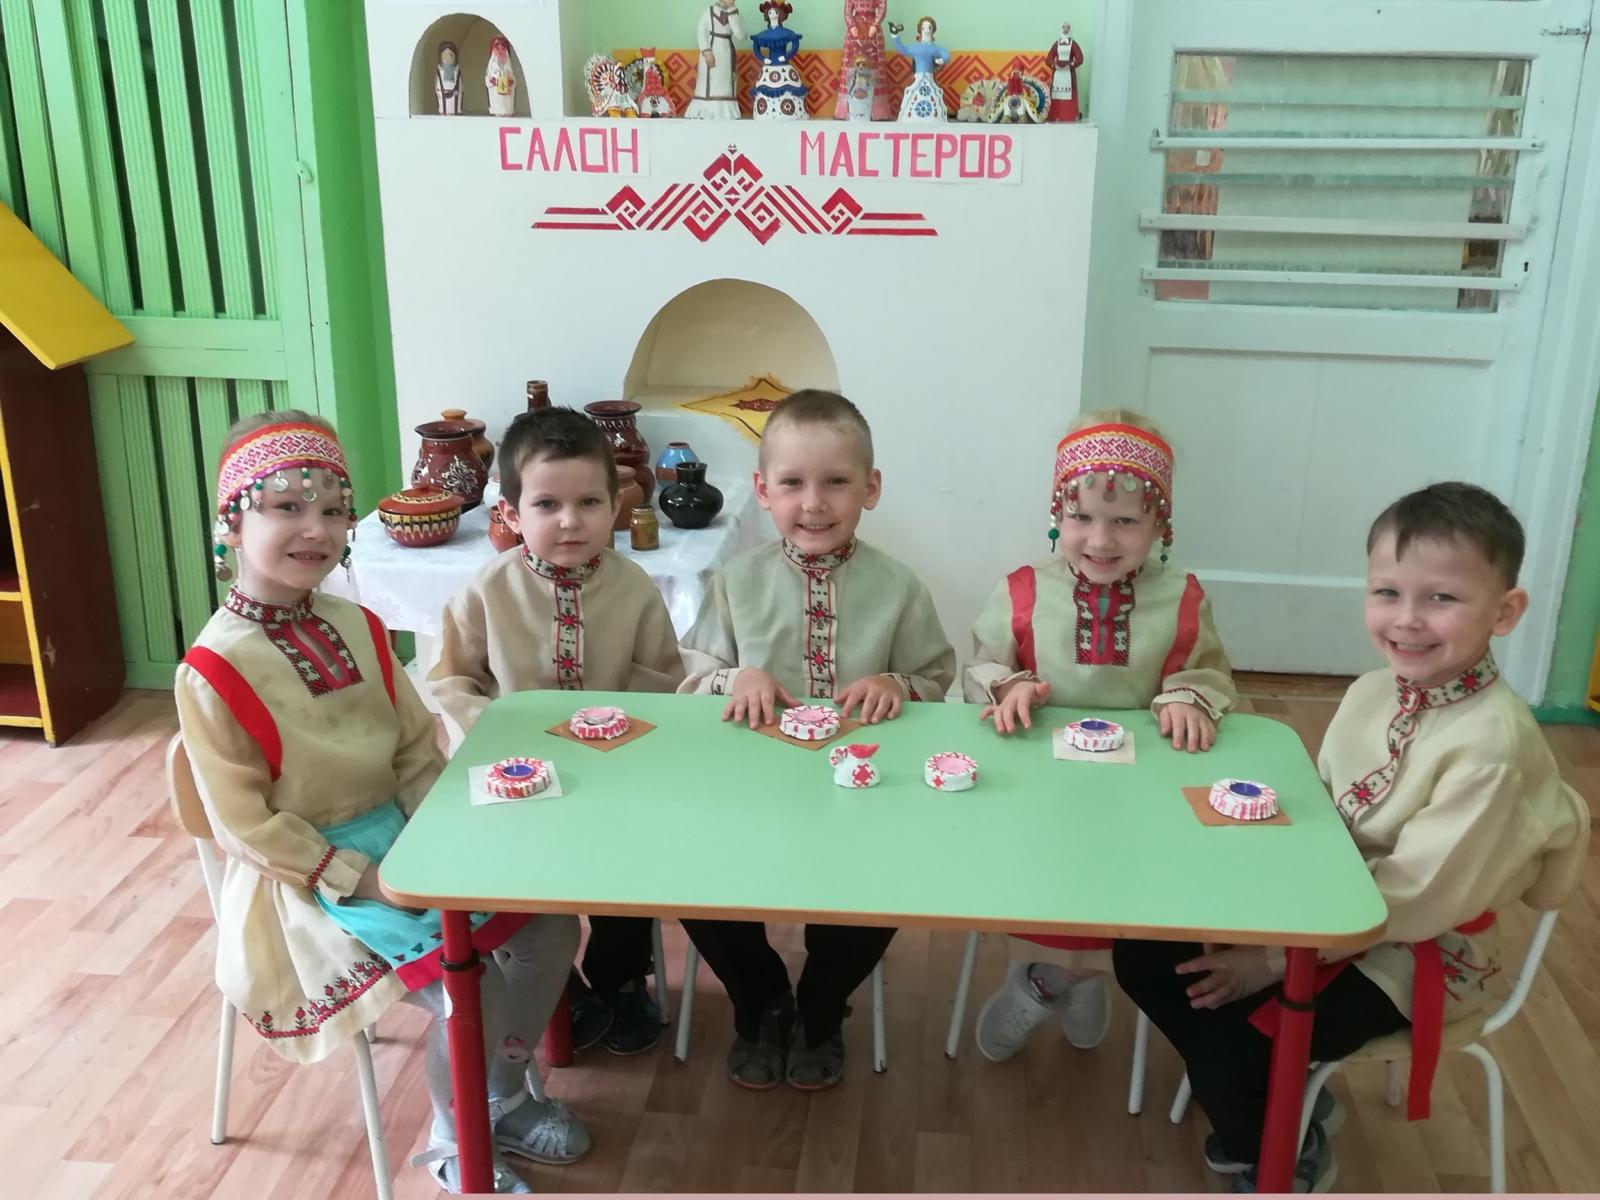 Салон мастеров «Славен мастерами родной Чувашский край»